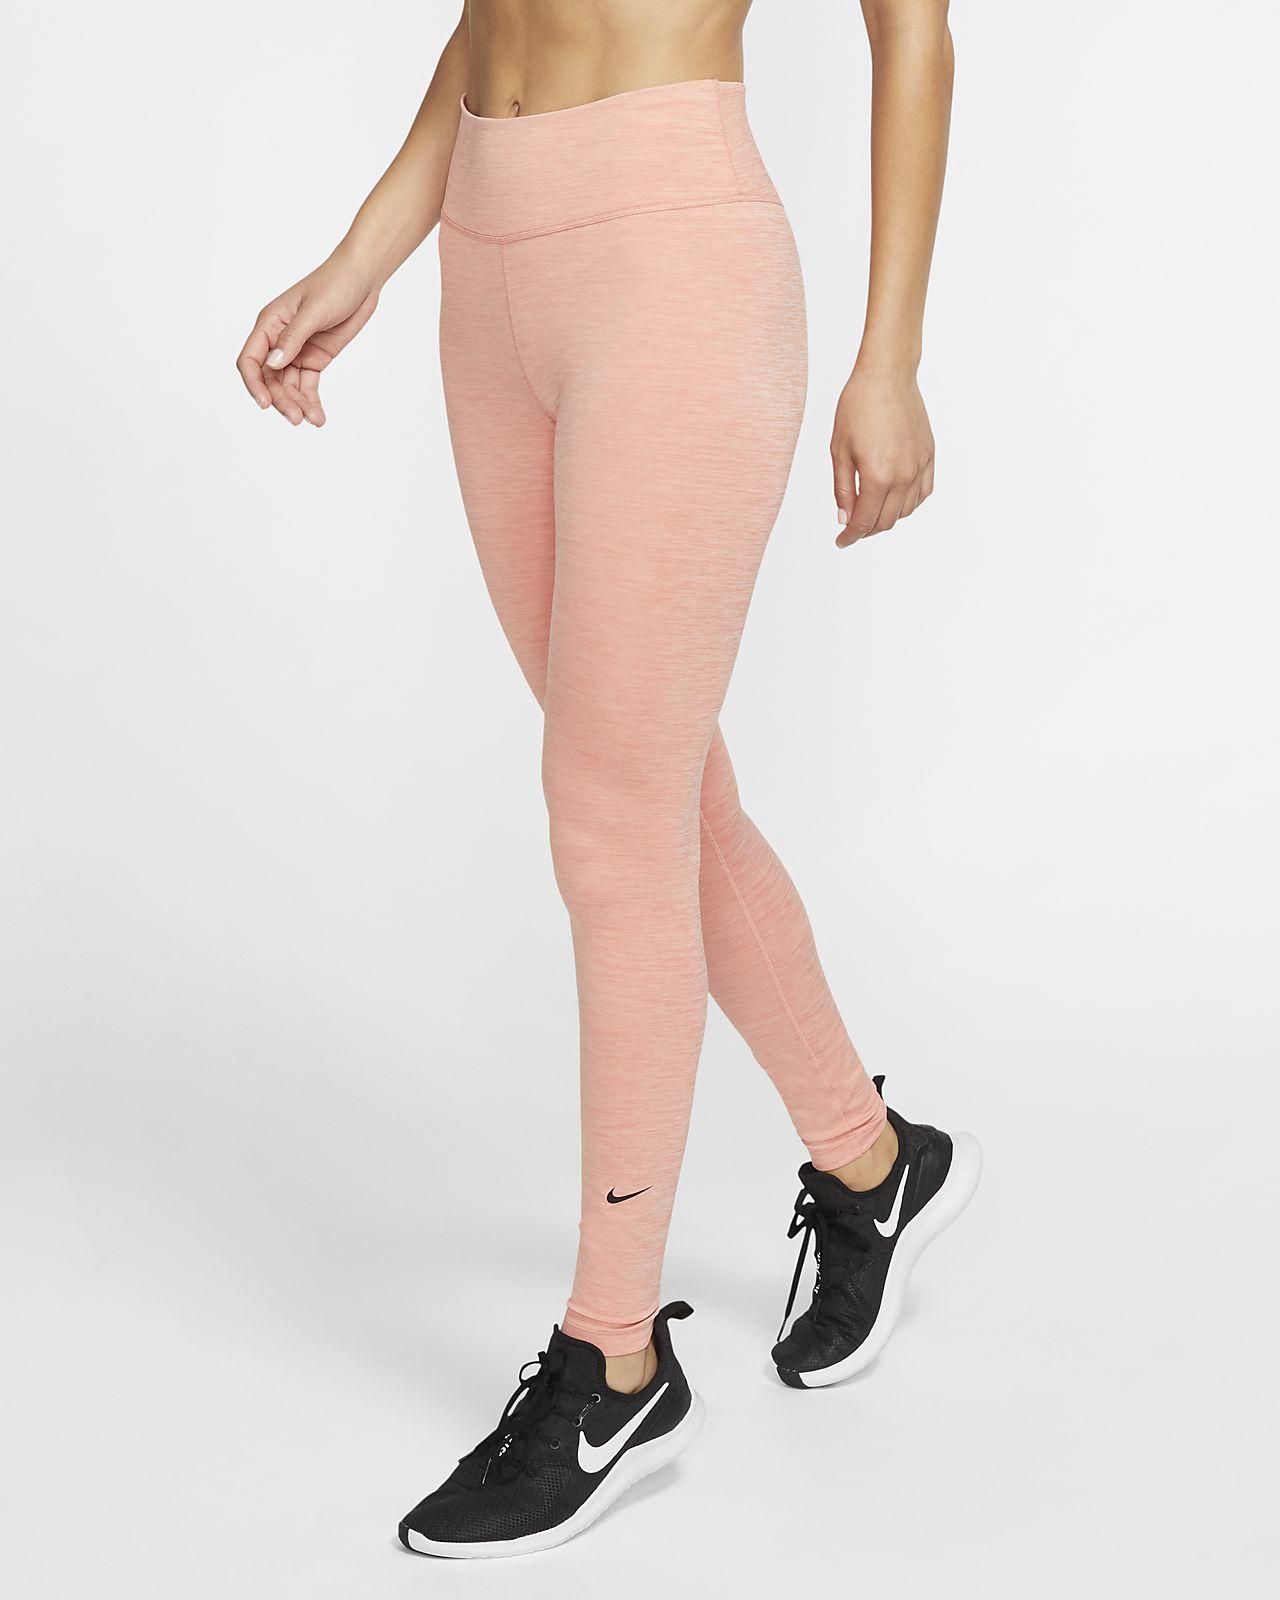 Legging Nike One pour Femme